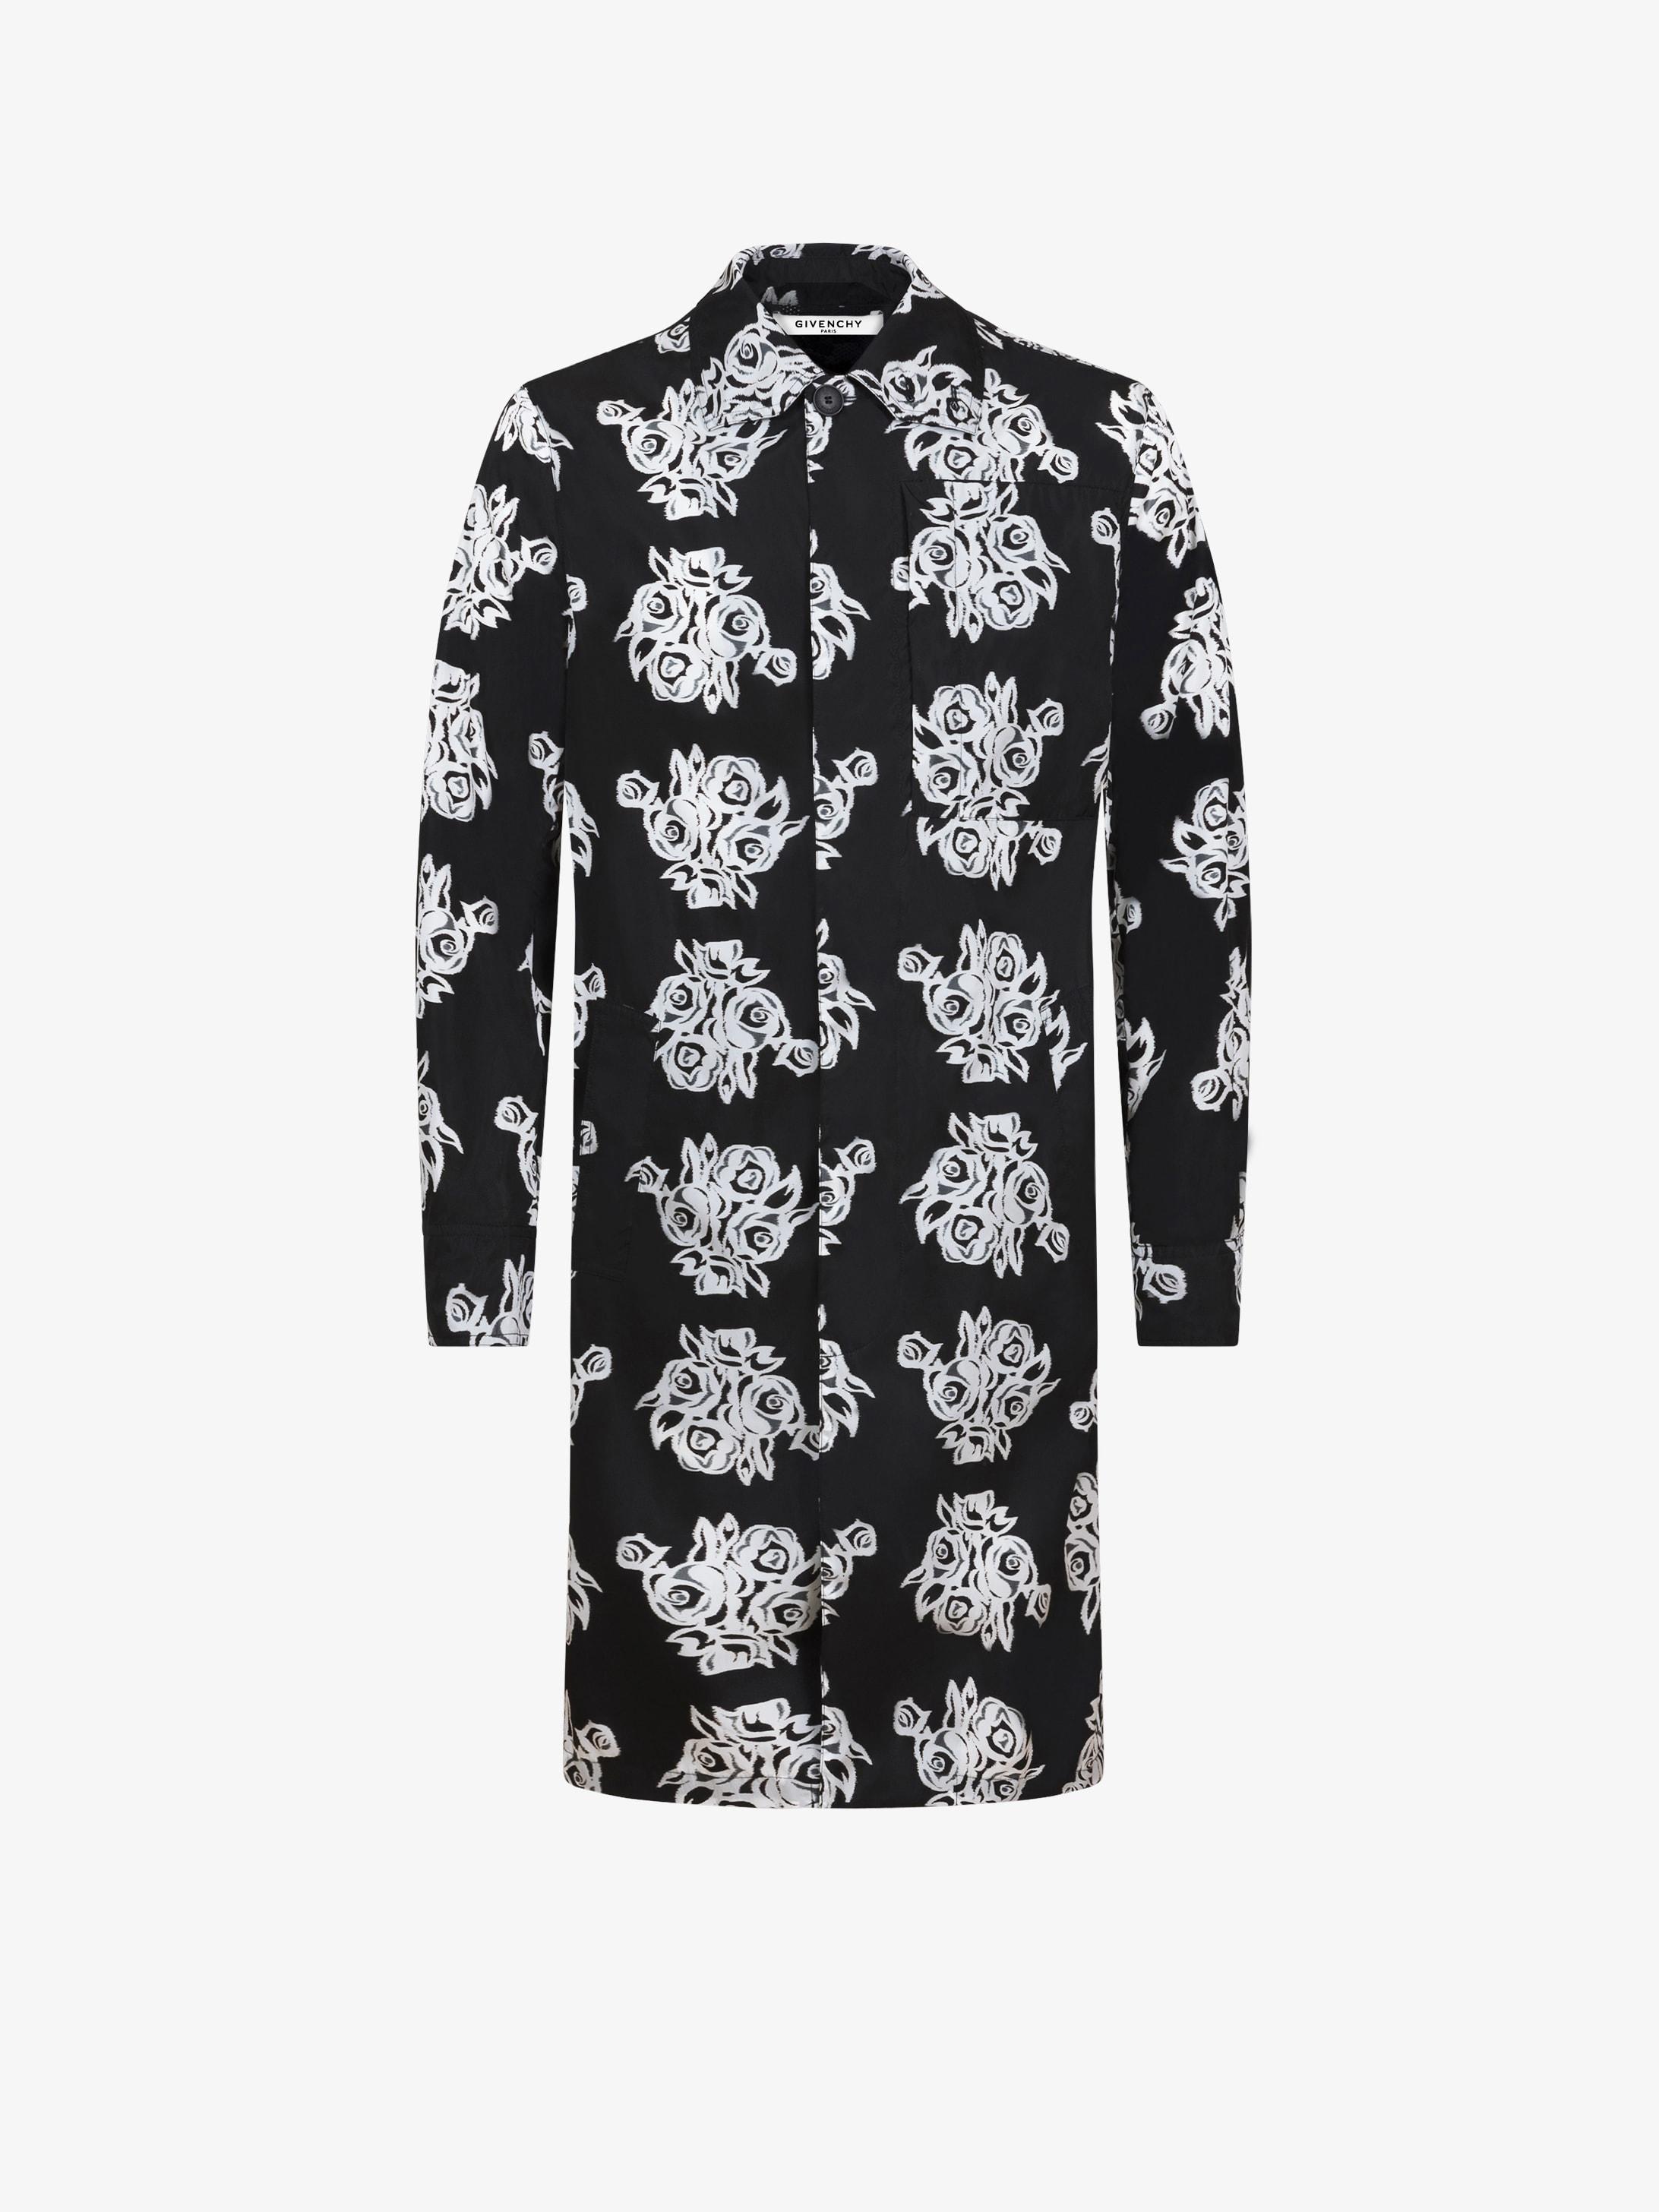 Flower printed carcoat